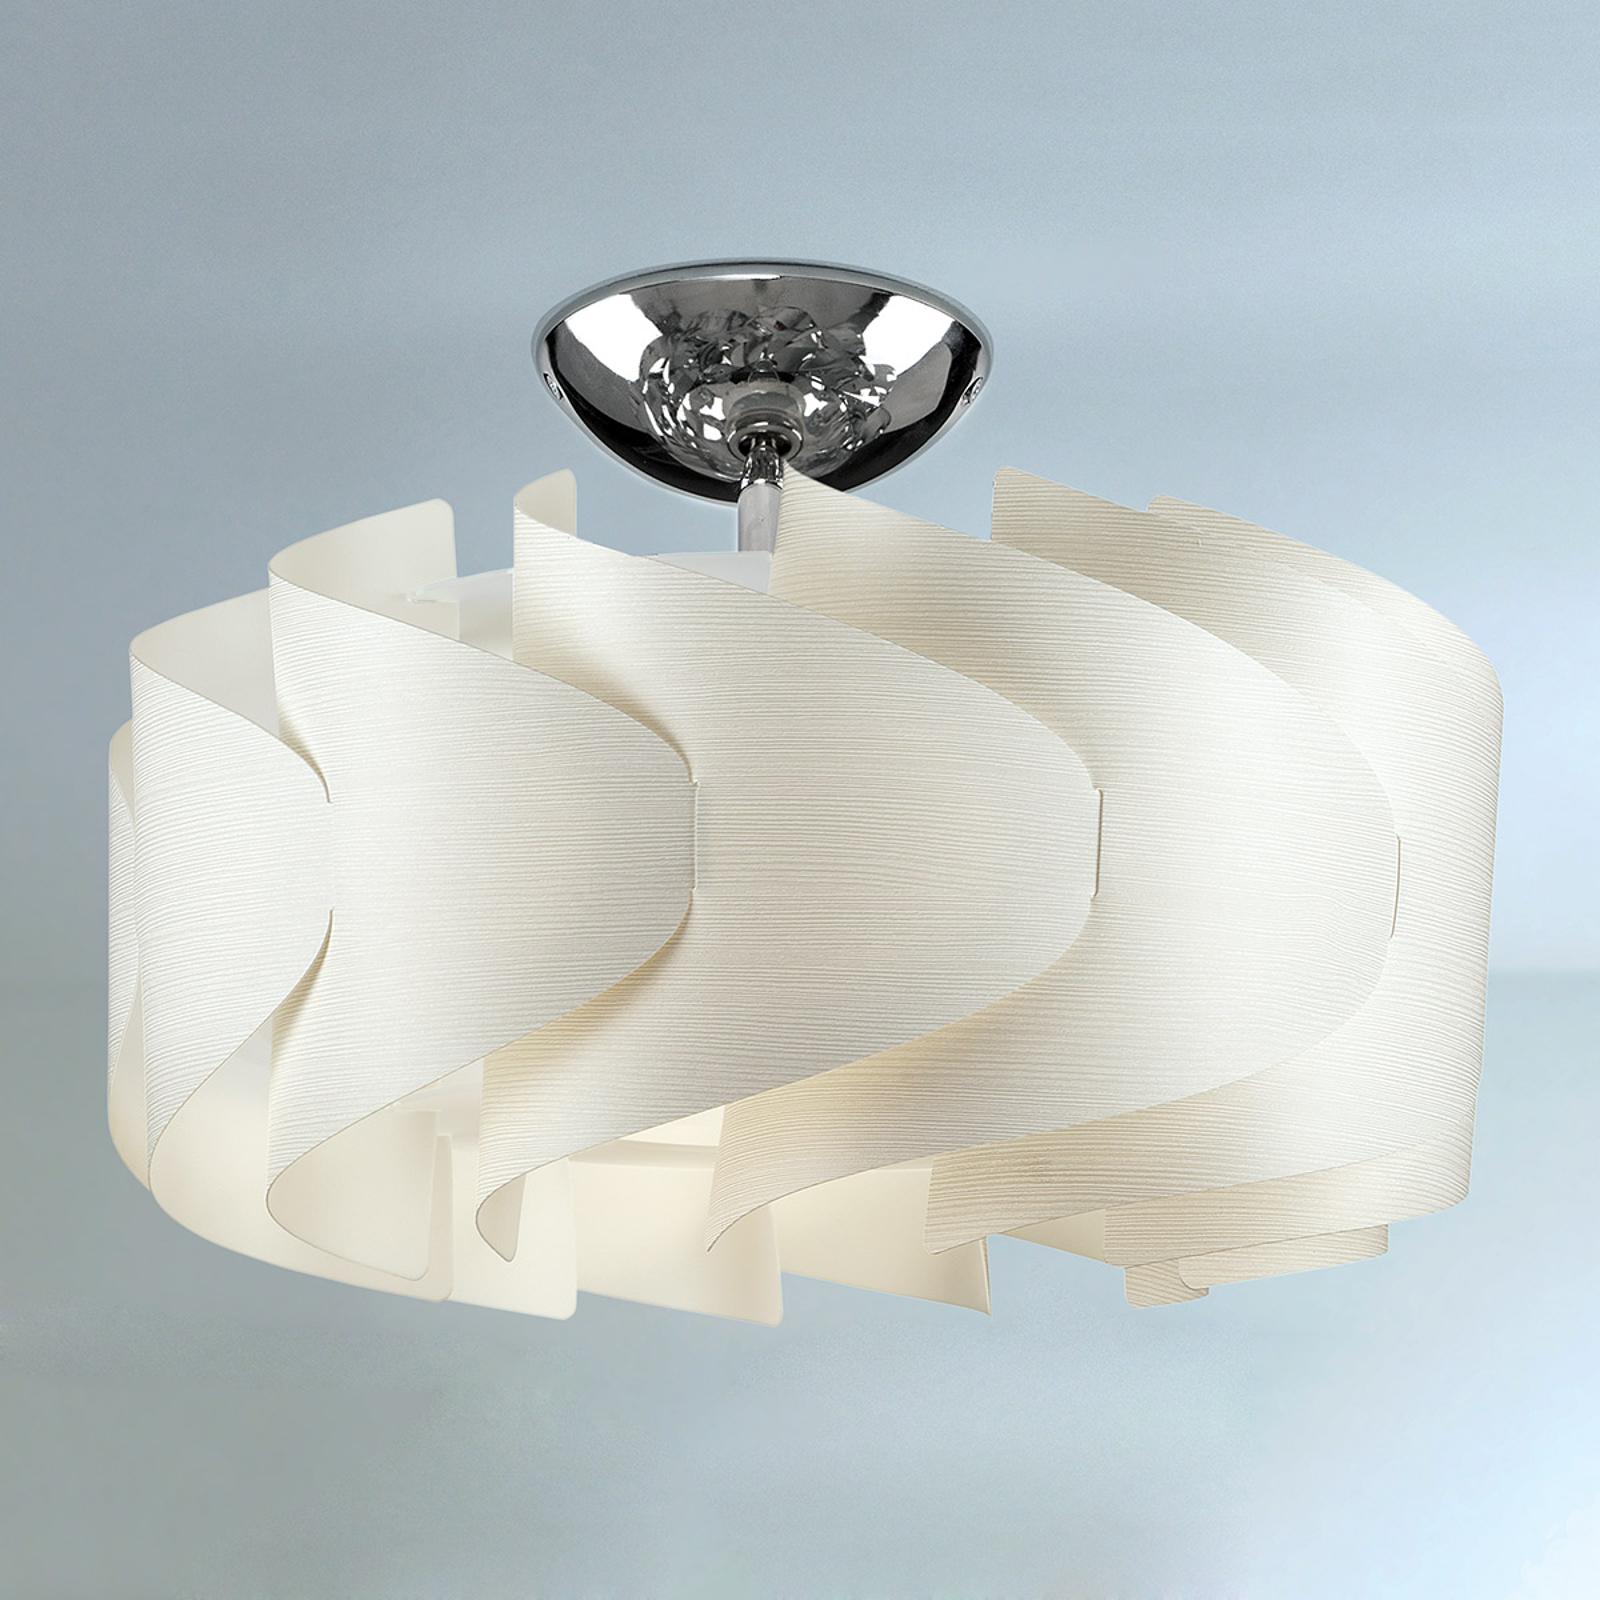 Lampa sufitowa Sky Mini Ellix wygląd drewna, biała